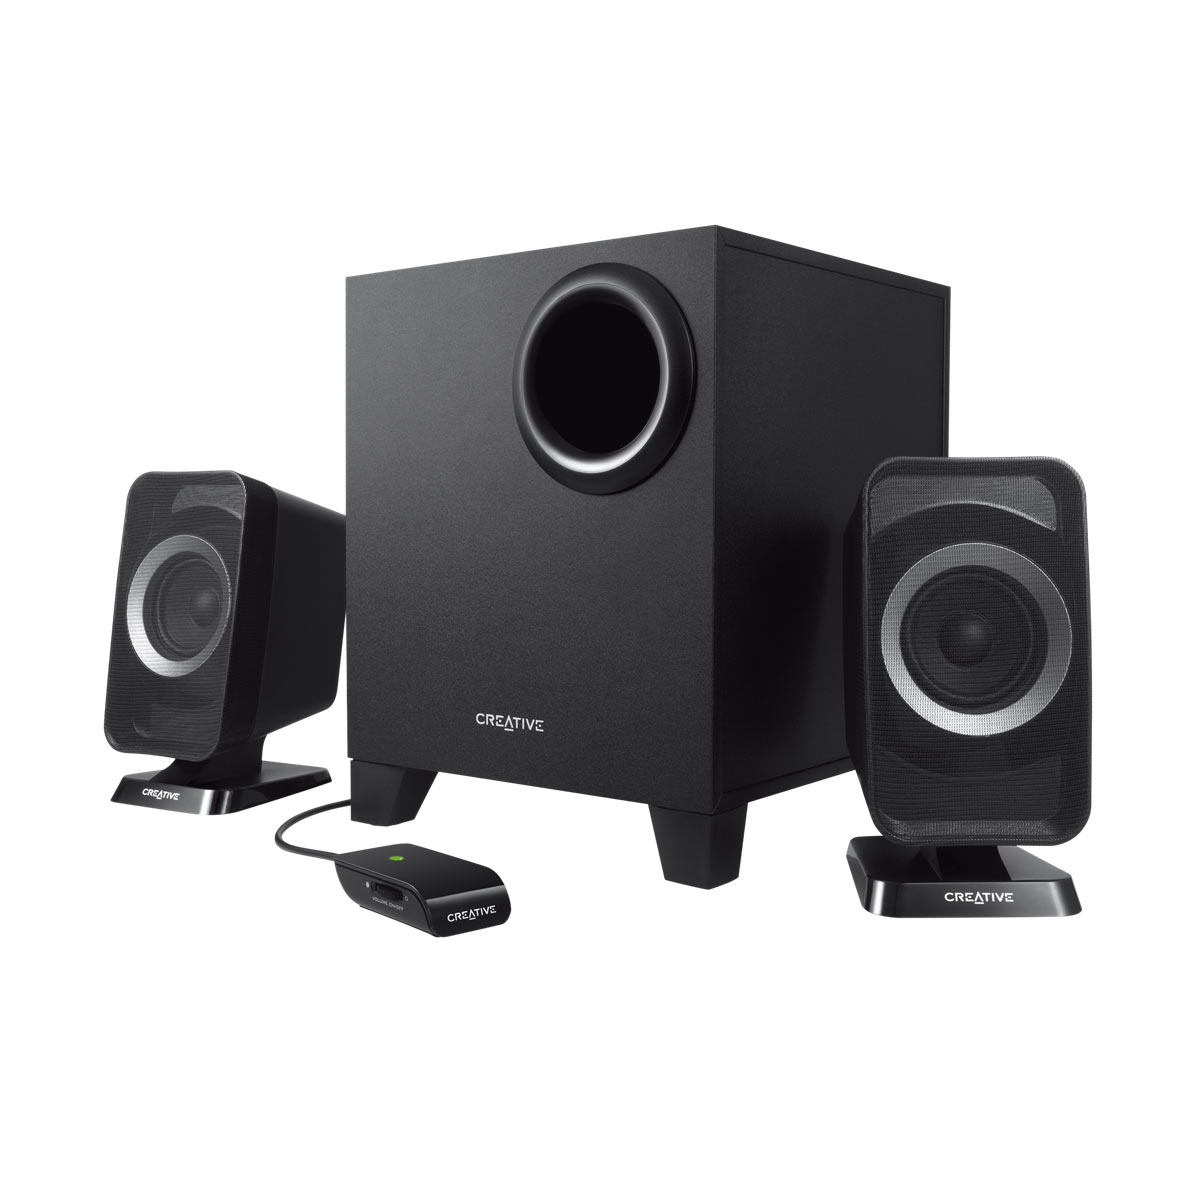 creative t3150 wireless enceinte pc creative technology. Black Bedroom Furniture Sets. Home Design Ideas